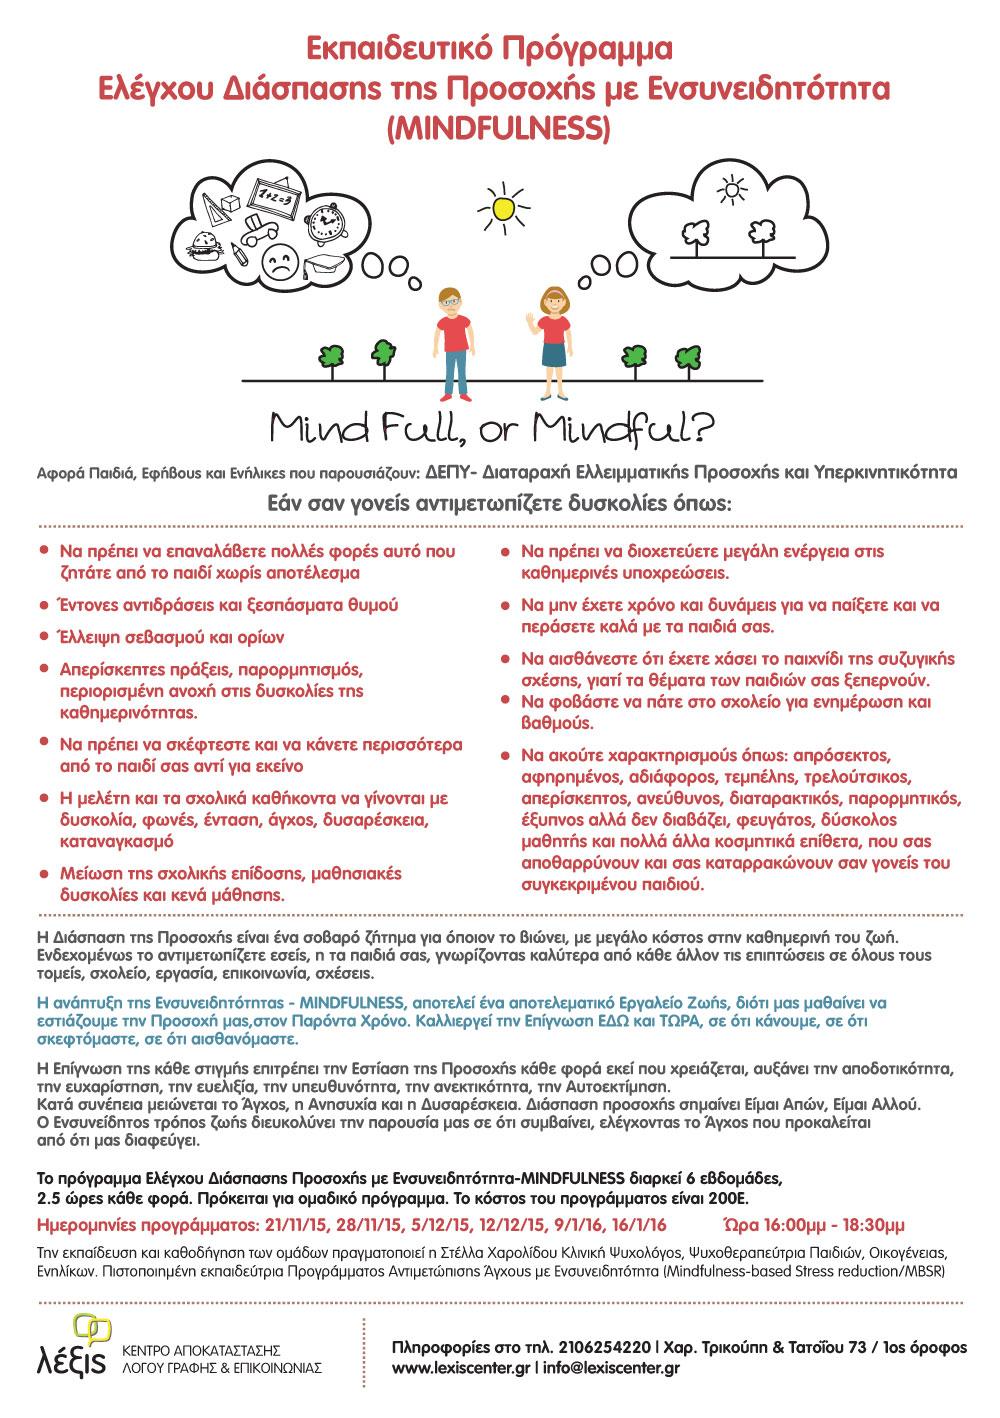 afisa_mindfulness1